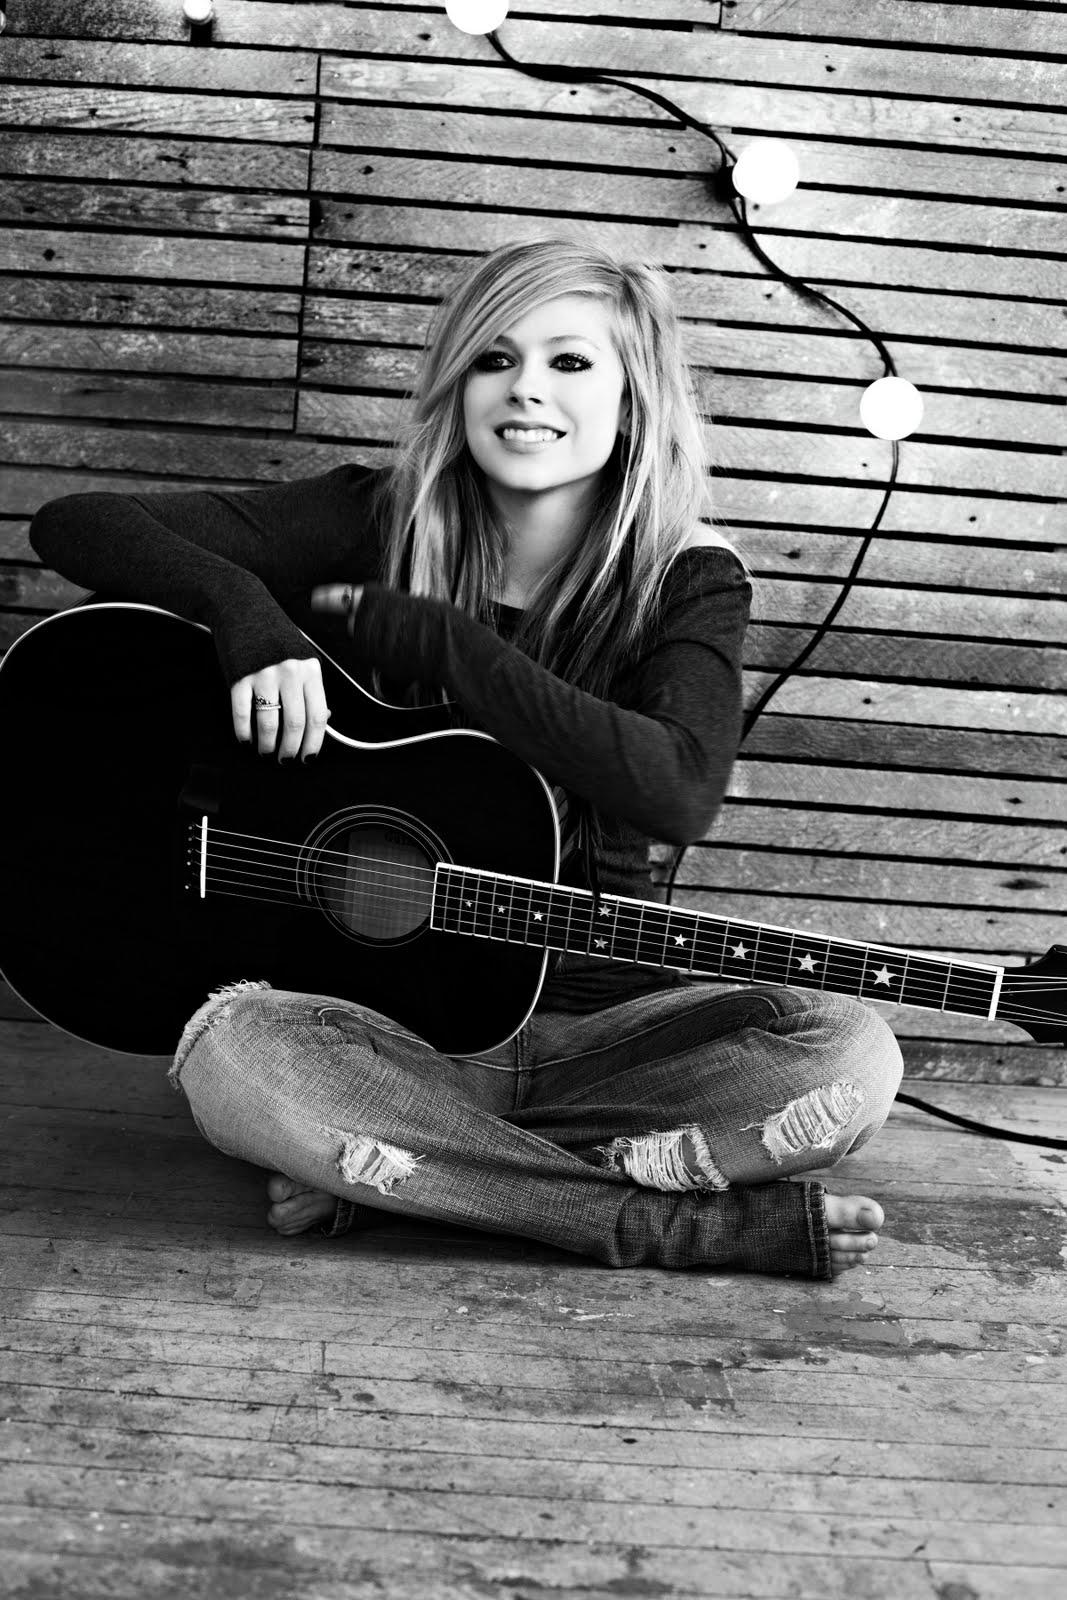 http://4.bp.blogspot.com/_h37maYhp3NE/TRzIB73G7fI/AAAAAAAAEv4/o5hZx-JMHEo/s1600/Avril-Lavigne-Goodbye-Lullaby-01.jpg